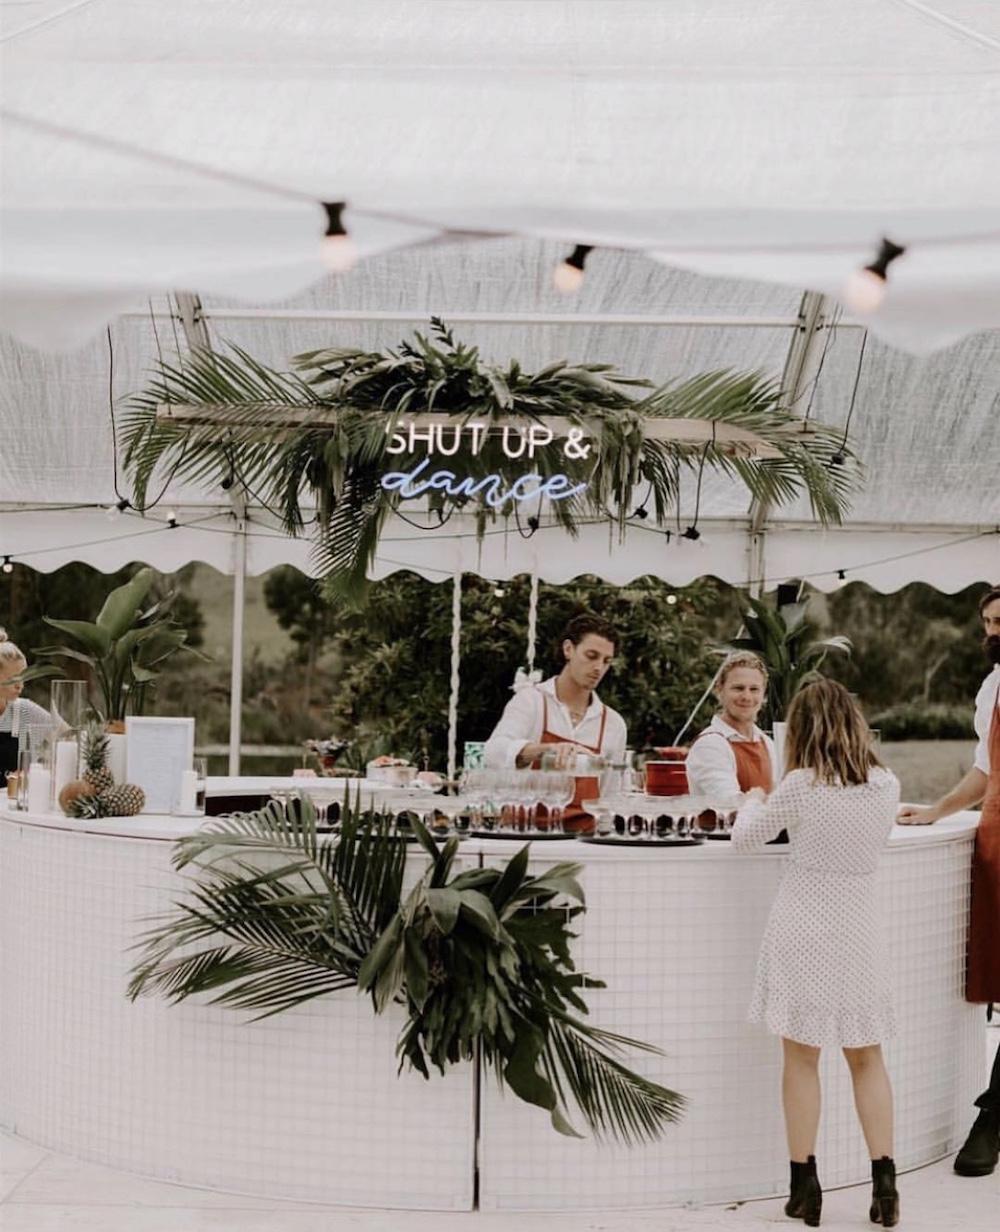 Wedding+Bar+Hire+Styling+Inspiration8.jpg